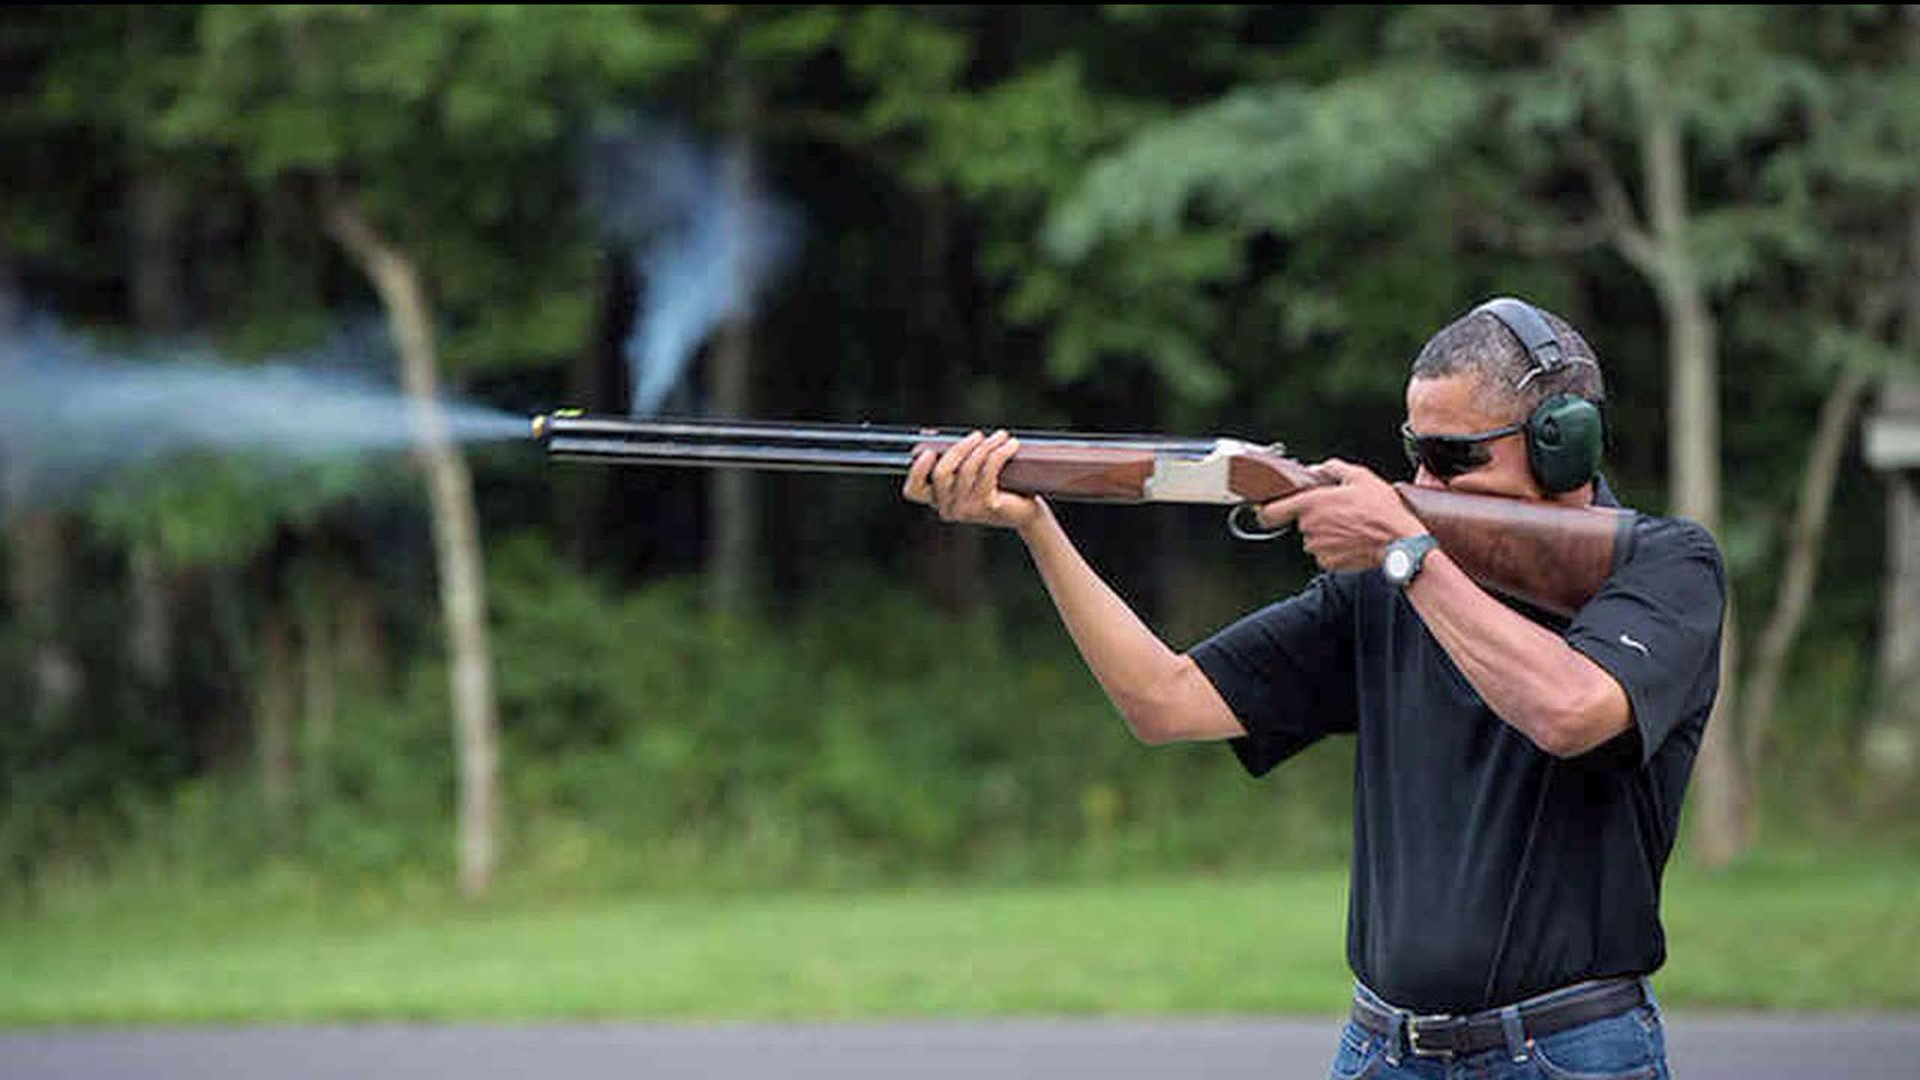 Obama: If You Like Your Gun You Can Keep Your Gun